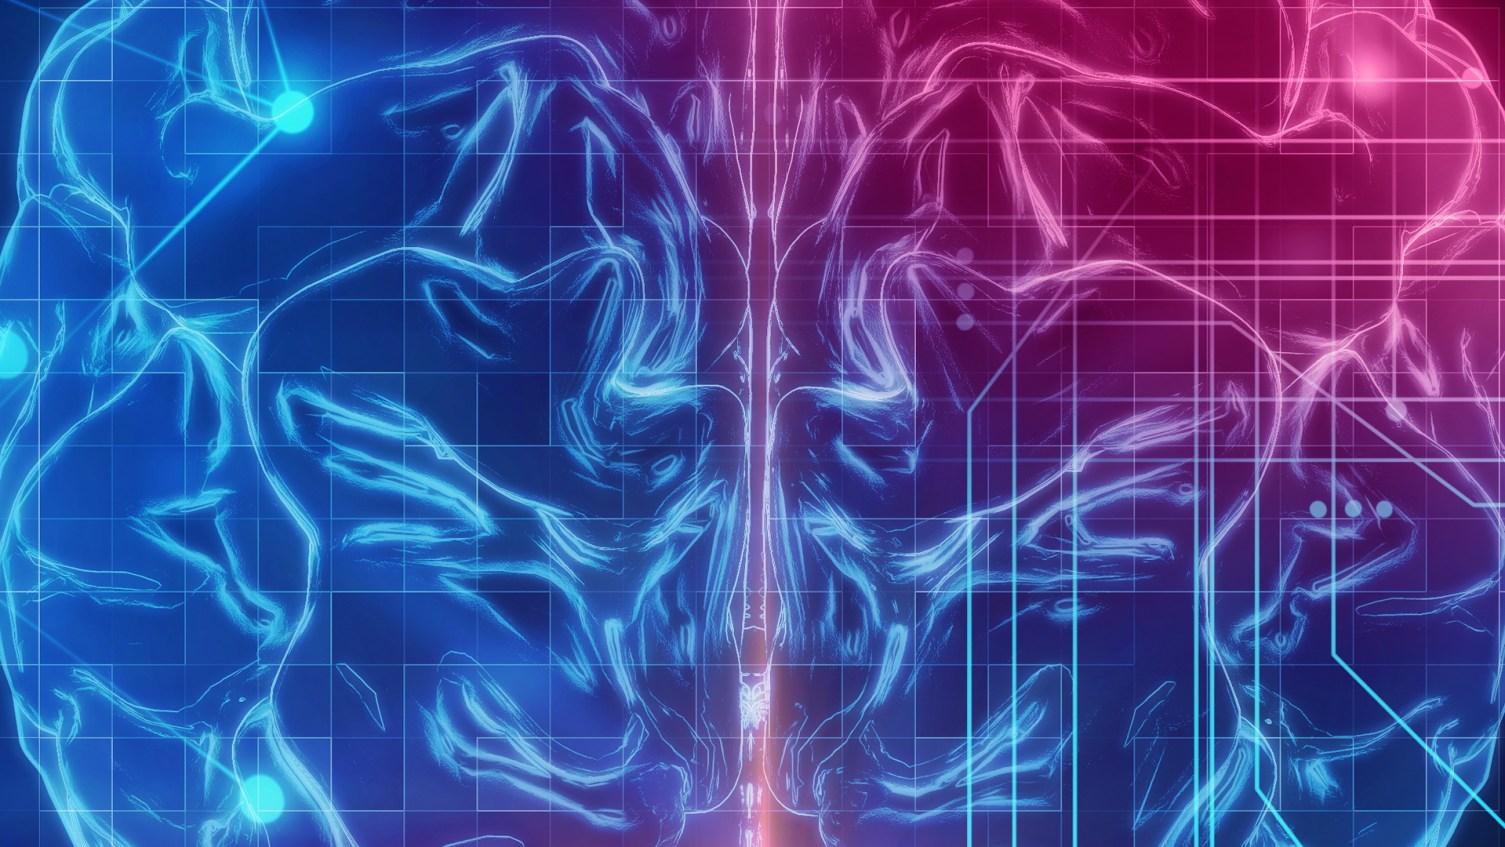 Conversational Pattern Of AI - Machines That Can Understand Human Speech